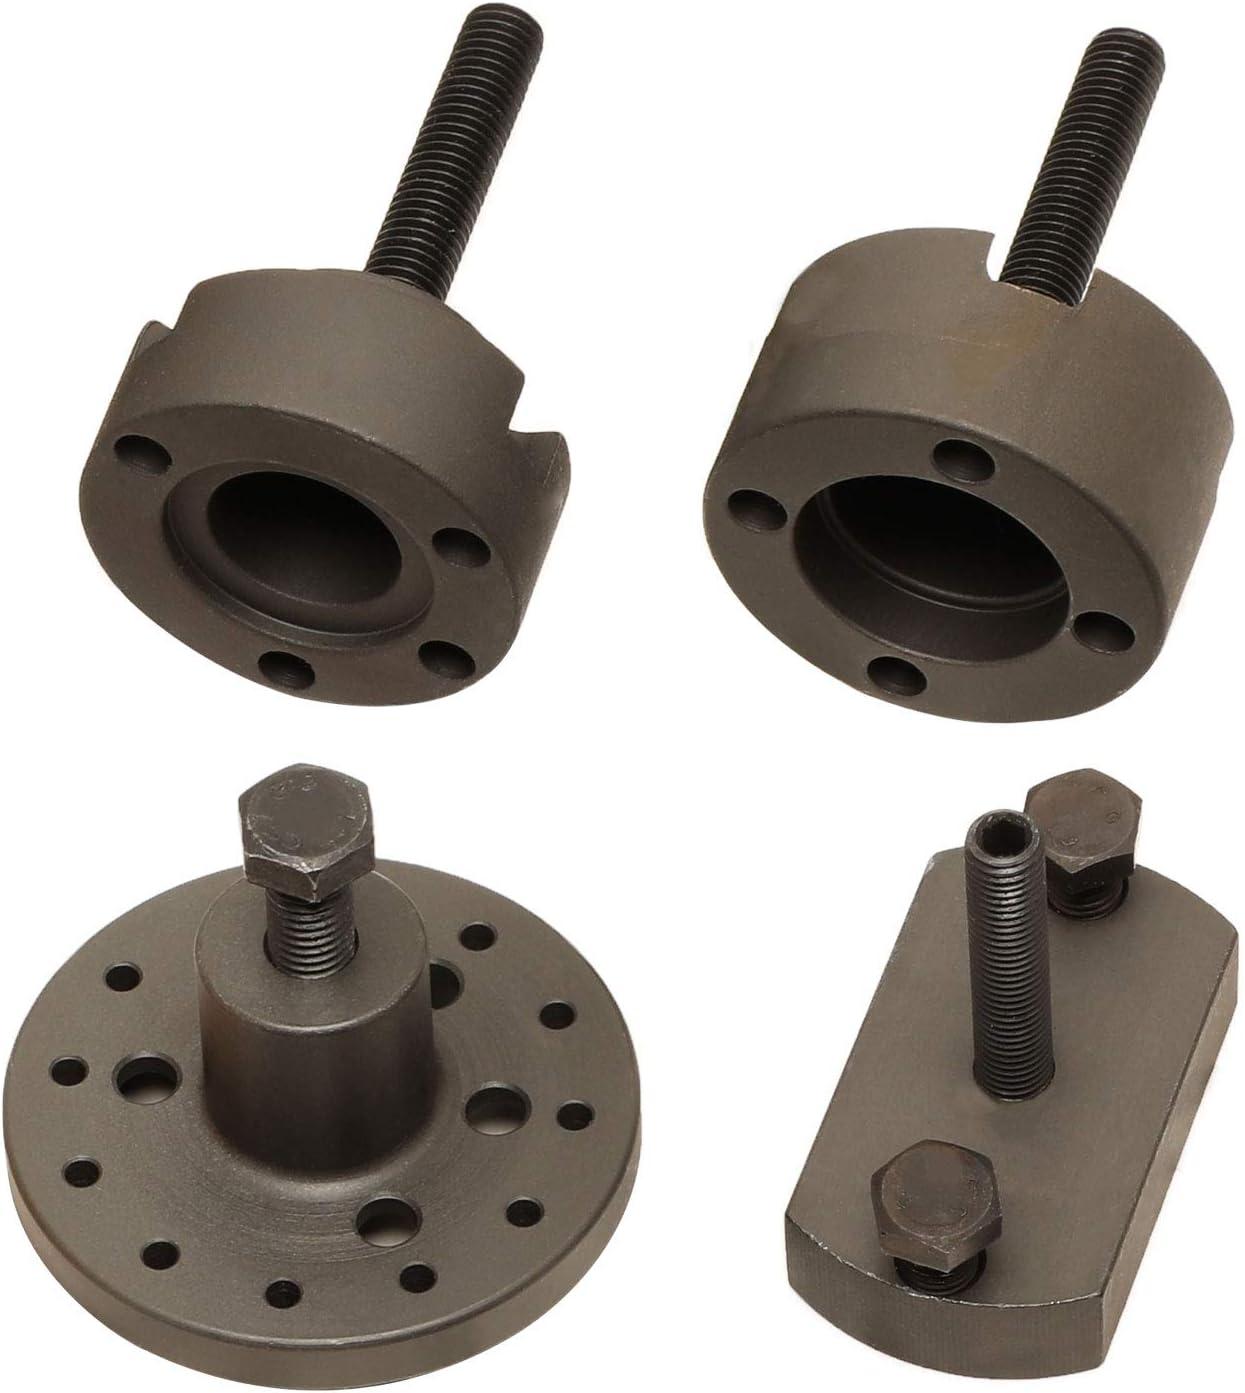 Crankshaft Front and Rear Oil Seal Remover /& Installer Tools Set ourantools Crankshaft Seal Removal /& Installation Tool Kit Compatible with BMW N20 B38 N42 N45 N46 N52 N53 N54 N55 Engines